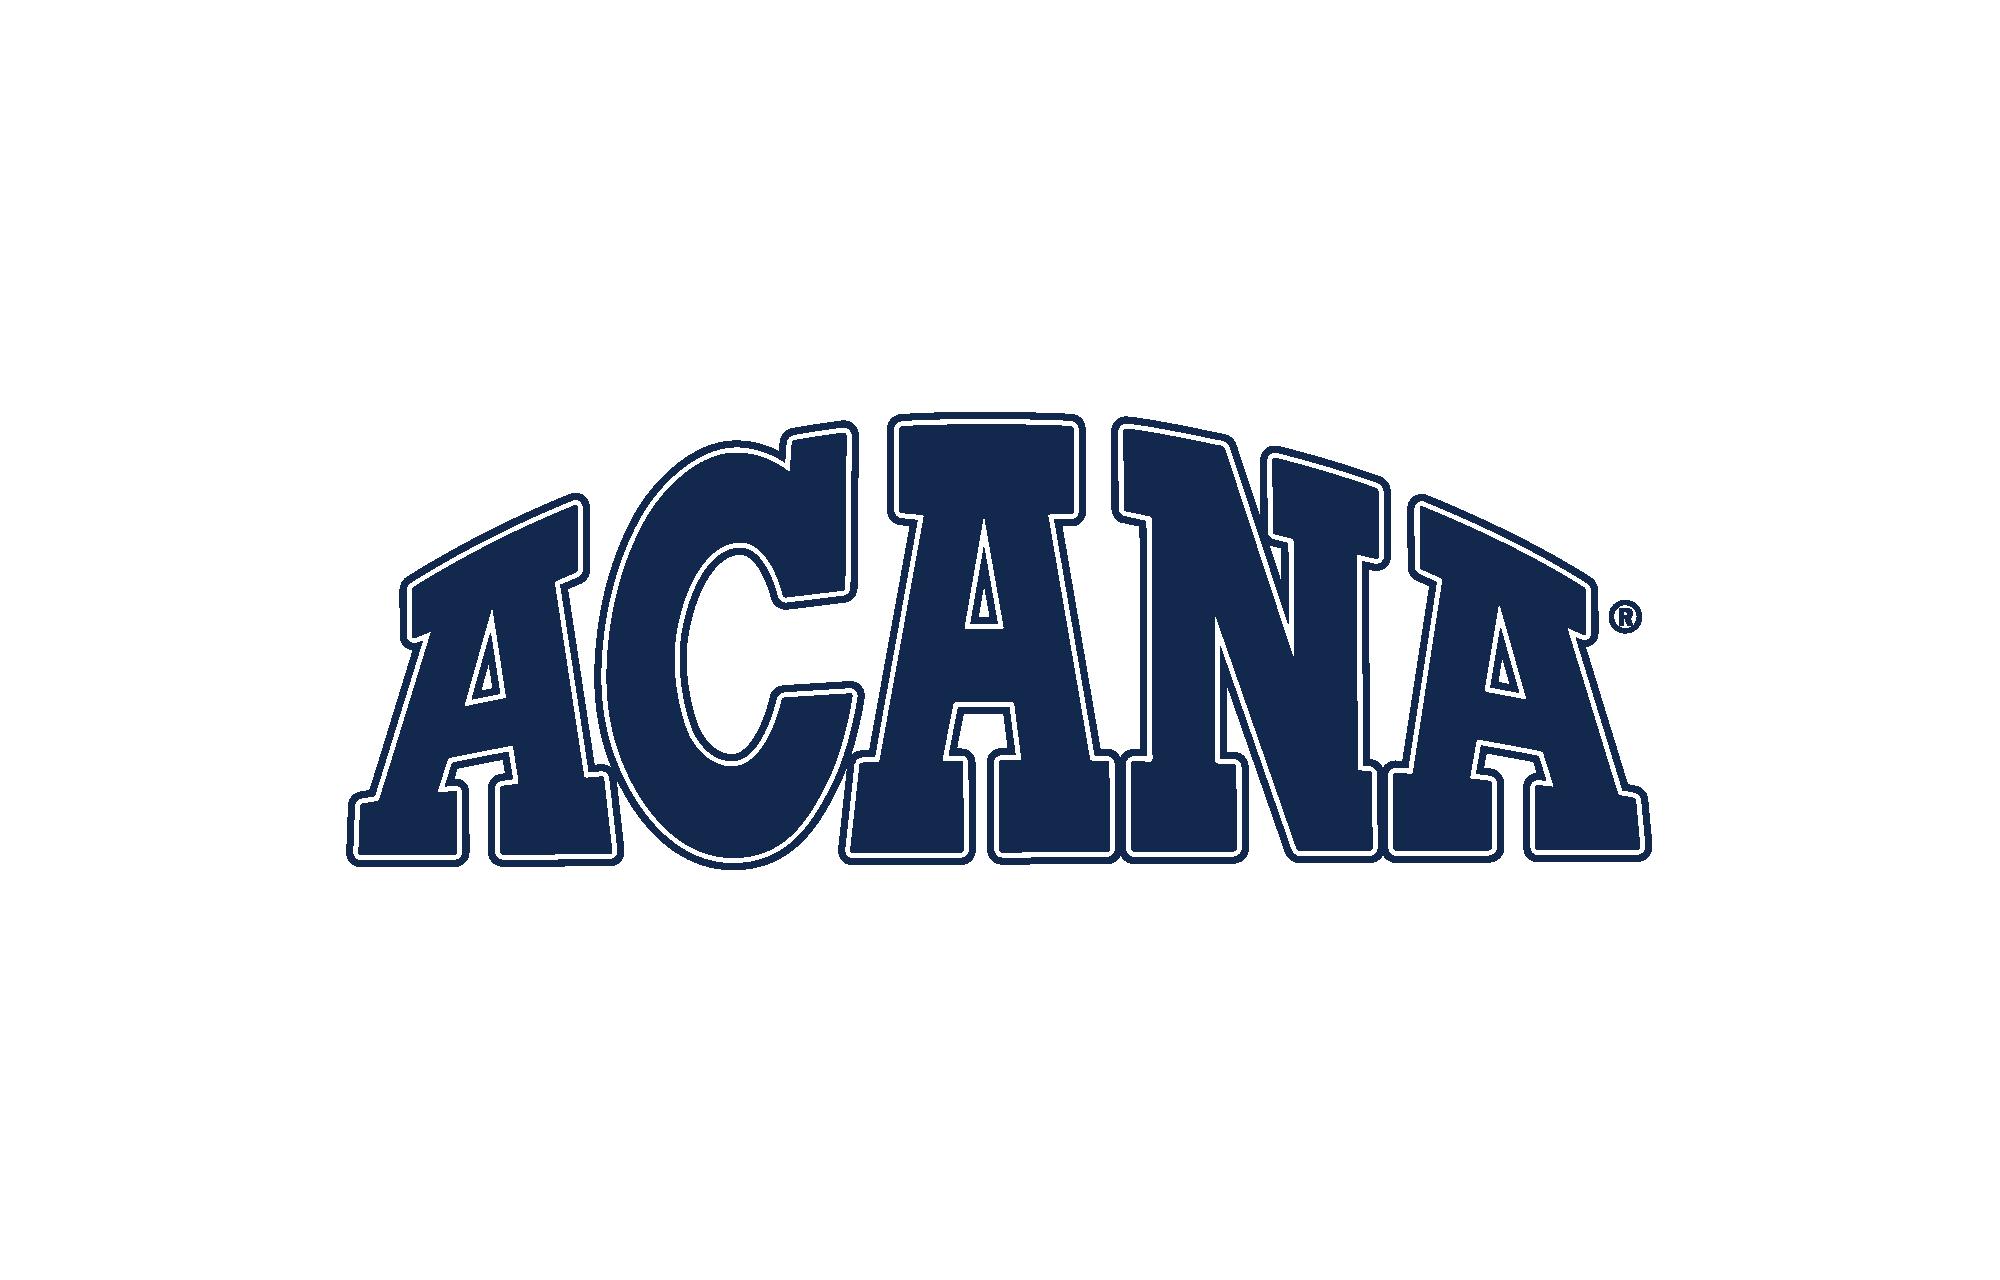 Blue Acana logo